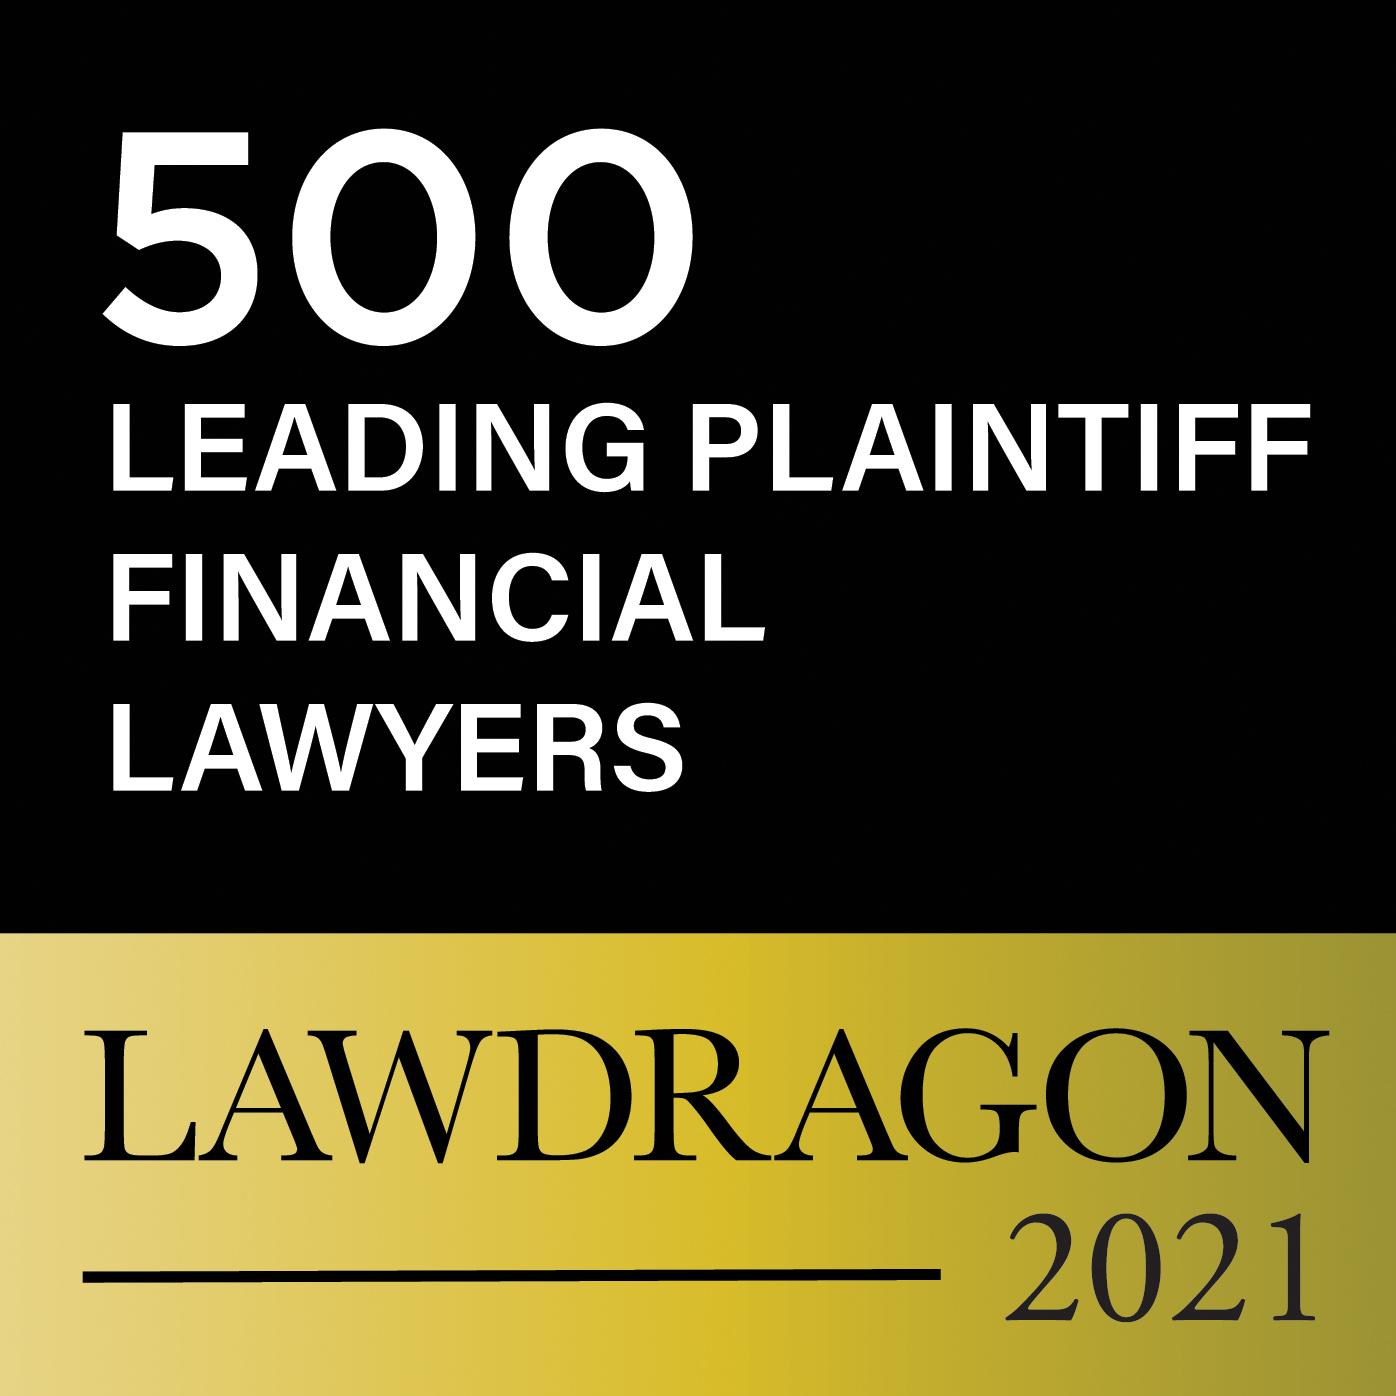 LD_500 Plantiff Financial Lawyers 2021